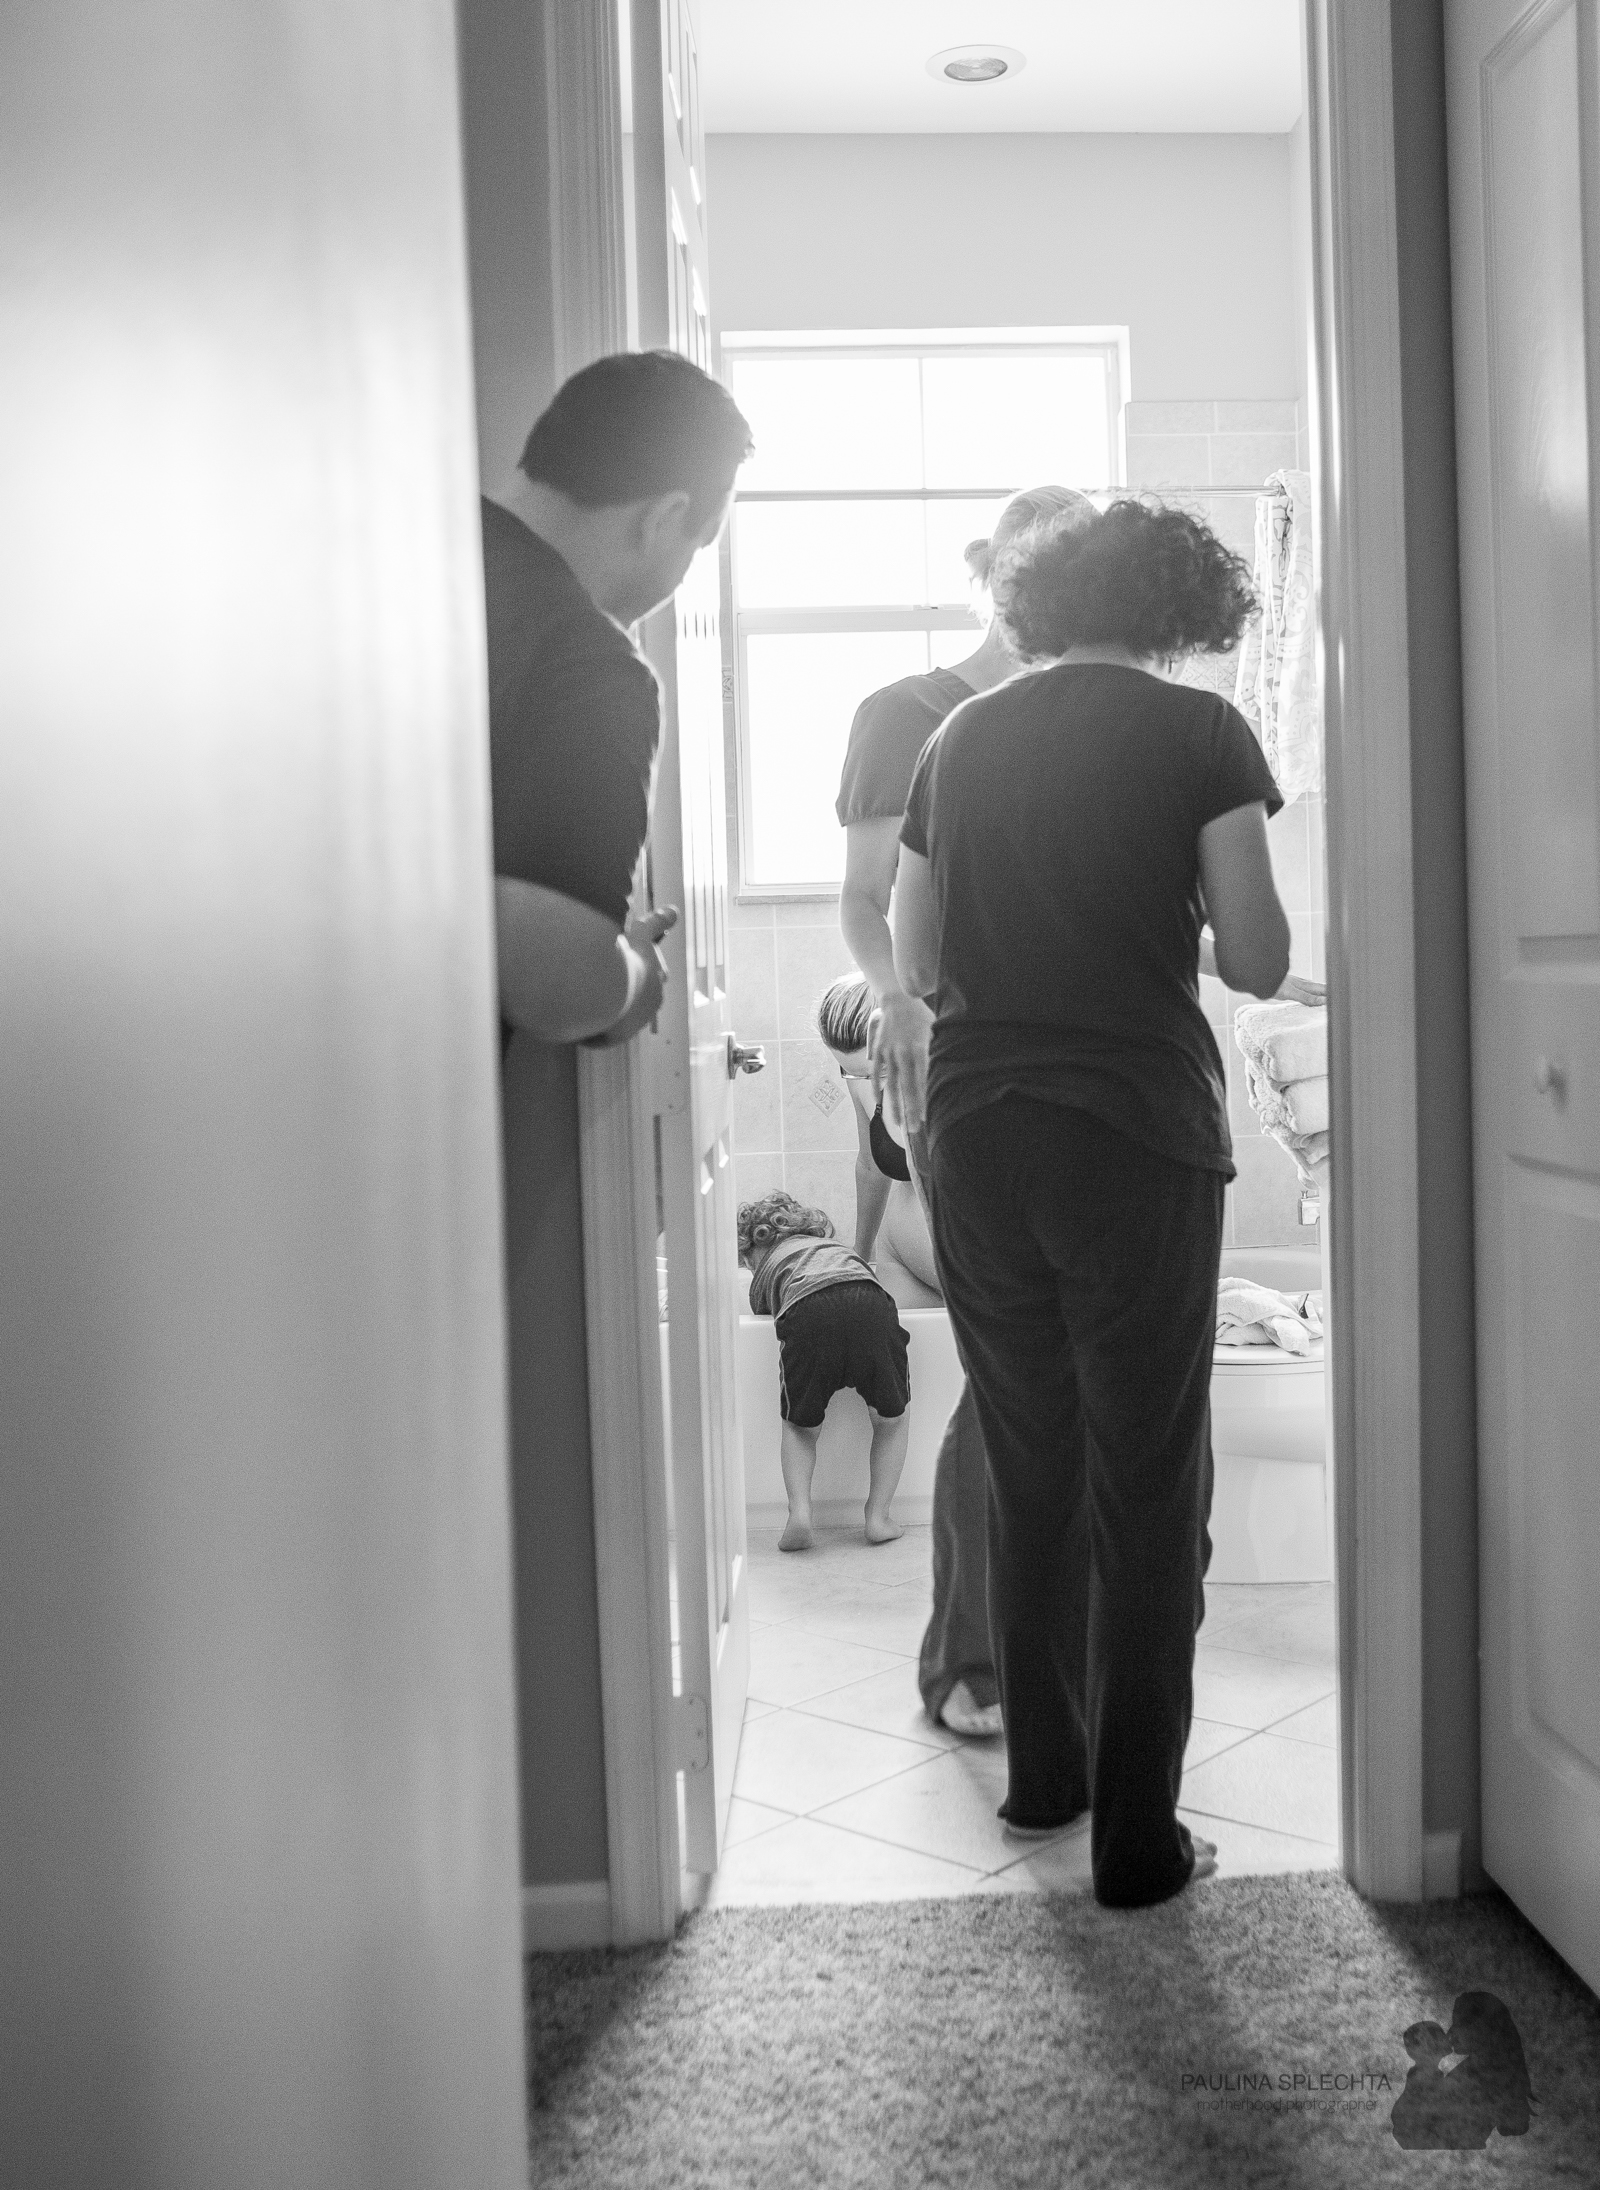 bocabirthphotographer-boca-birth-photographer-birth-center-hospital-hypnobirthing-midwife-doula-trimester-breastfeeding-florida-hollywood-delray-stop-nausea-morning-sickness-6.jpg